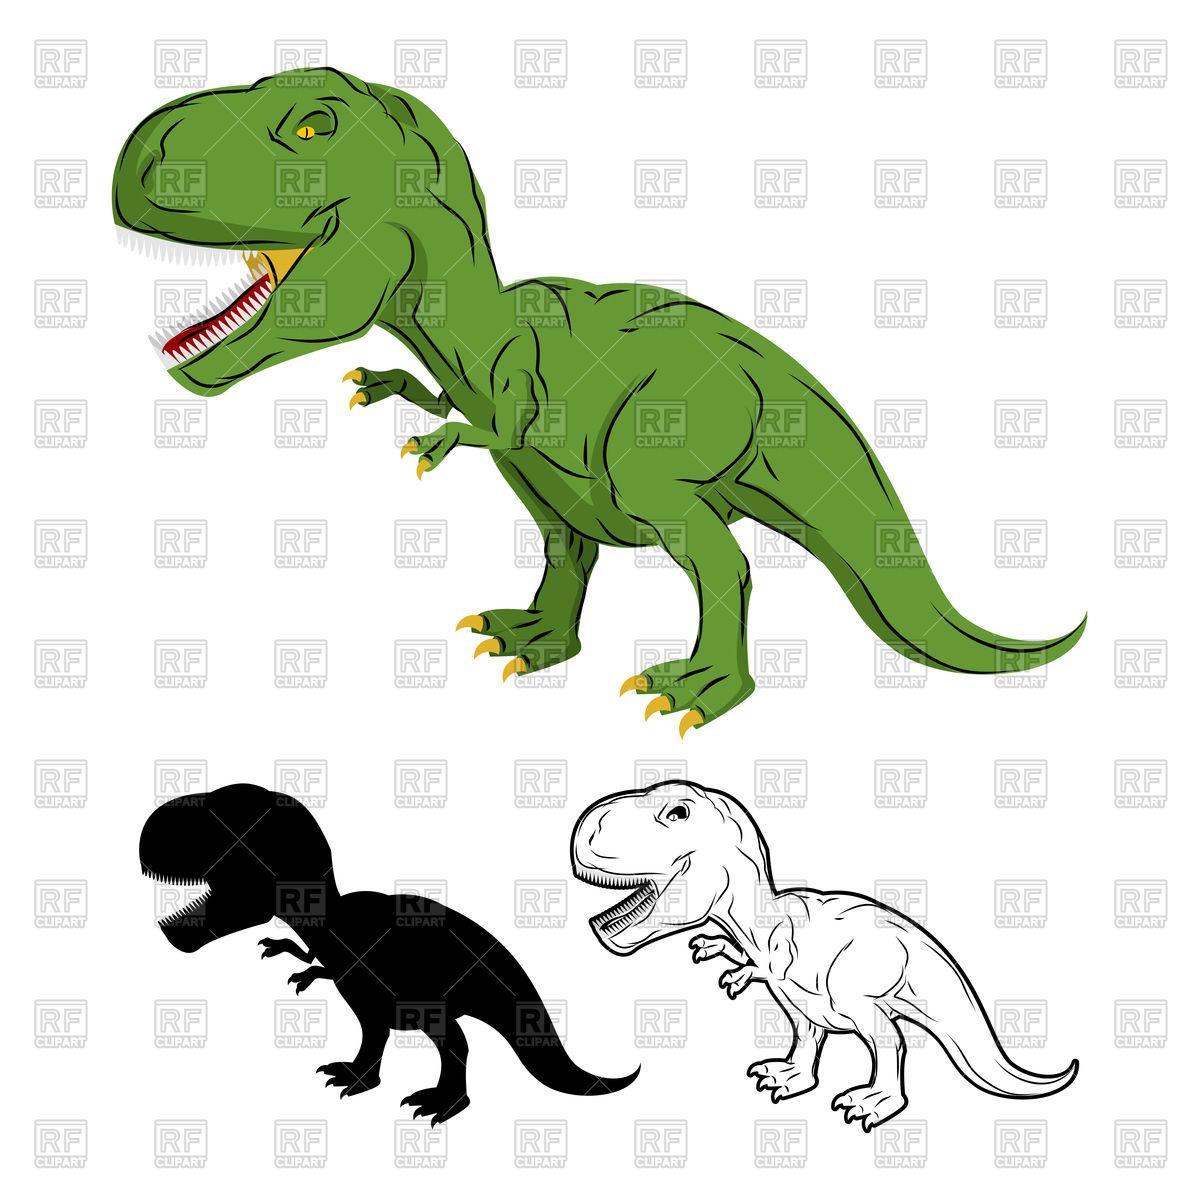 1200x1200 Green Dinosaur, Skeleton Of Tyrannosaurus Rex Royalty Free Vector